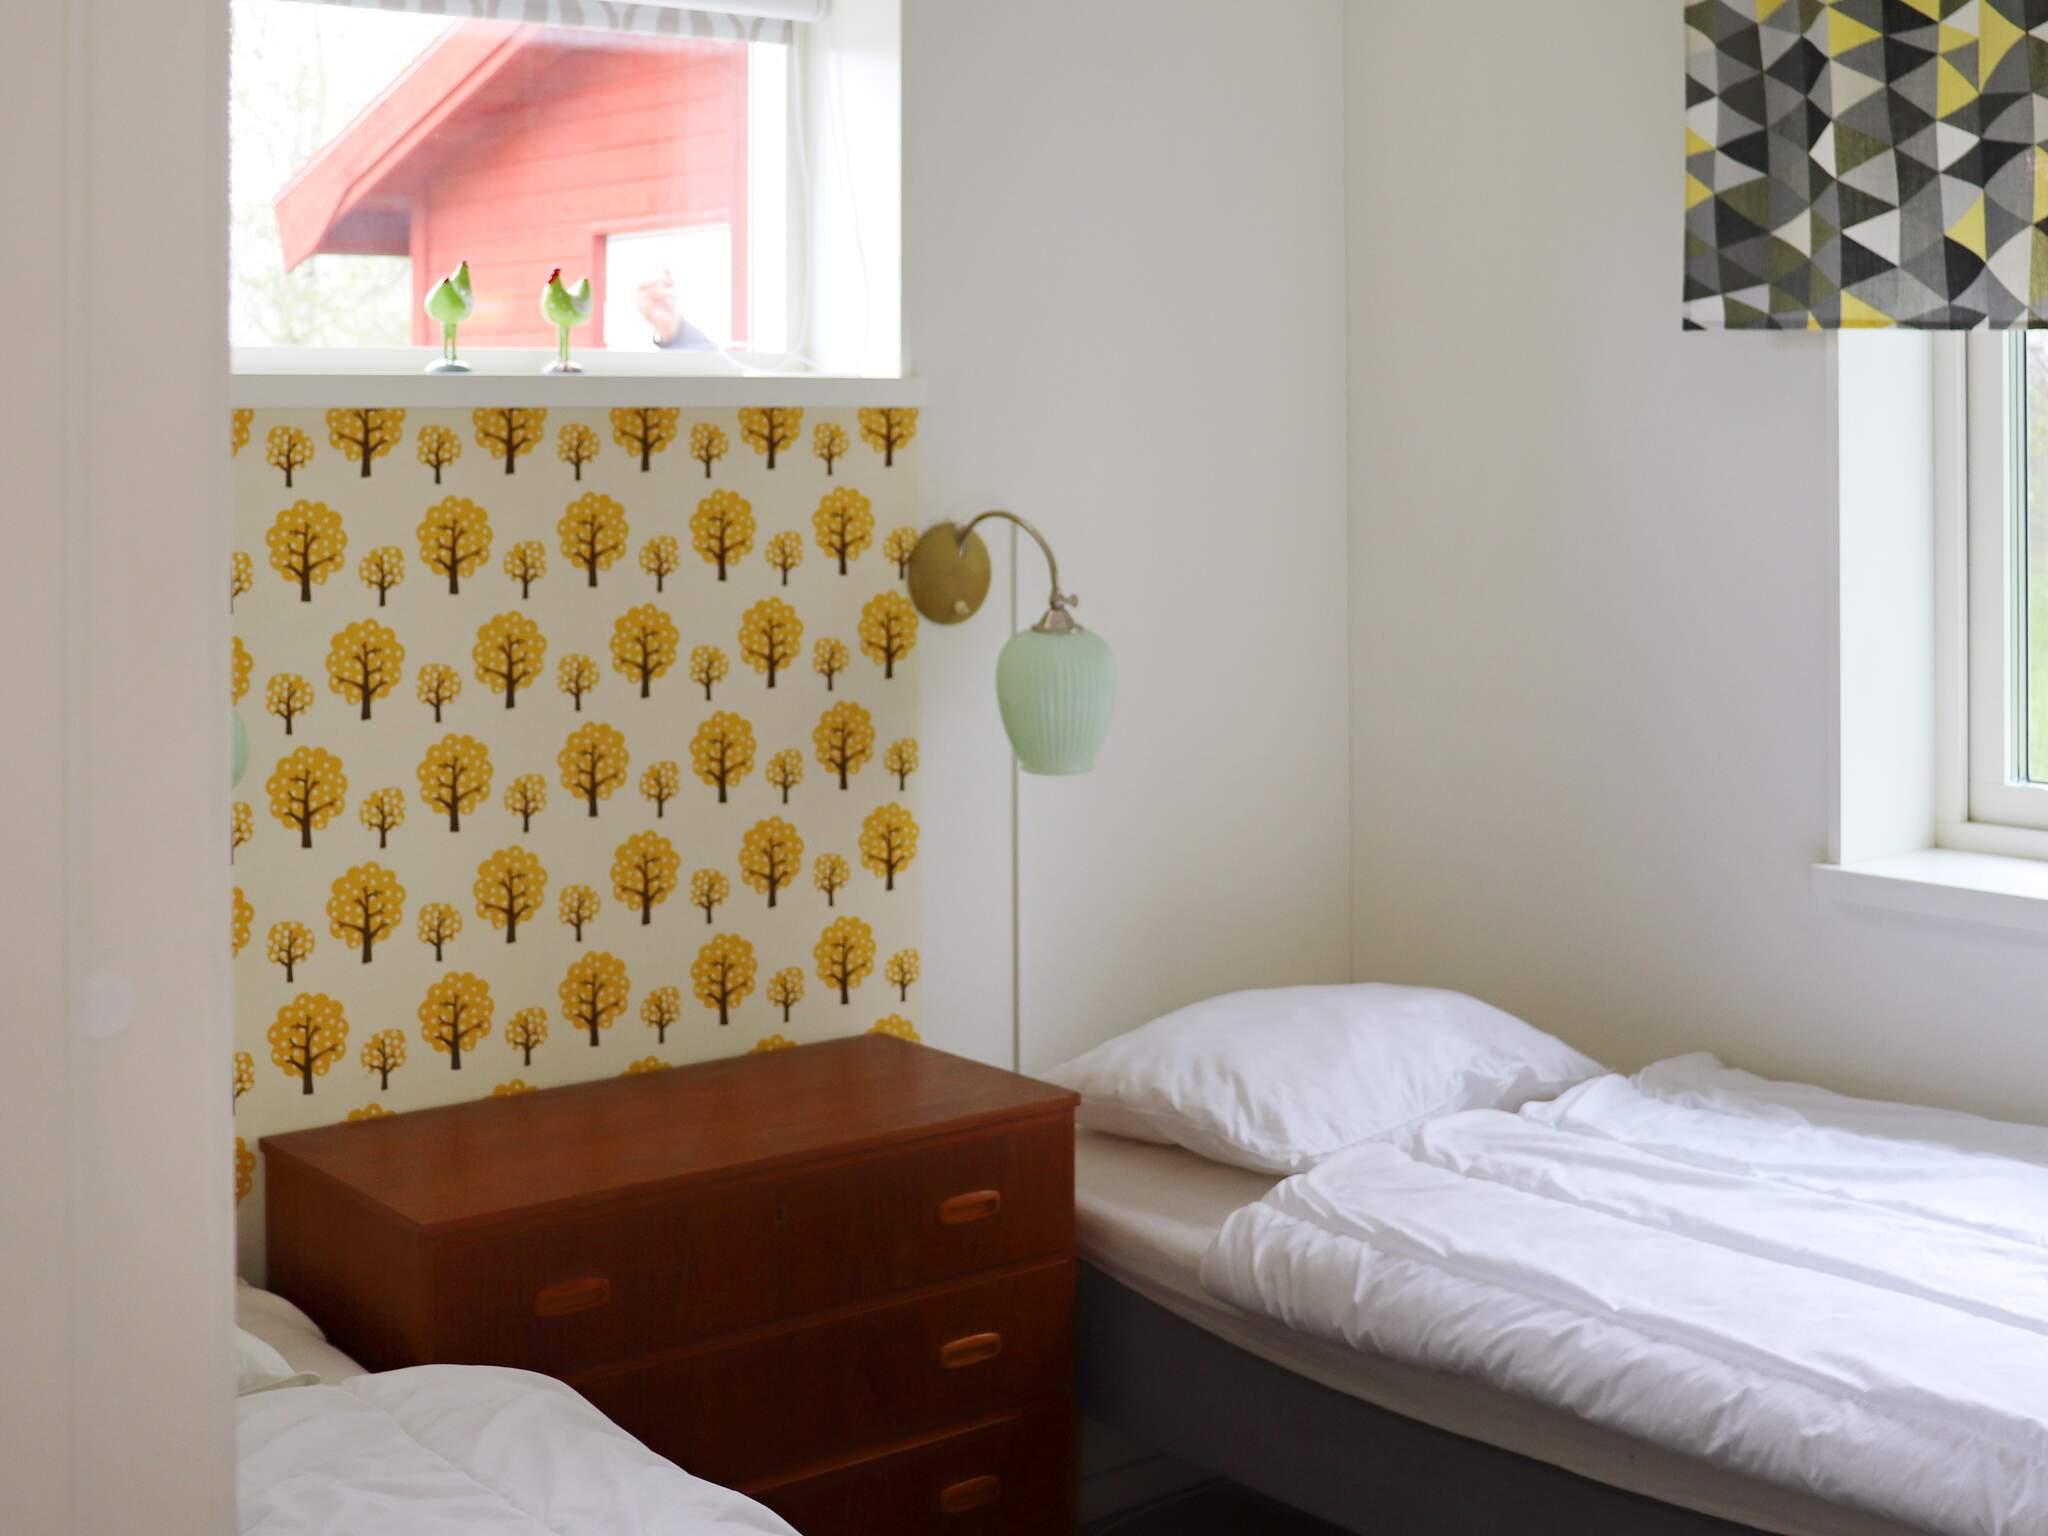 Ferienhaus Degeberga (2624324), Degeberga, Skane län, Südschweden, Schweden, Bild 8